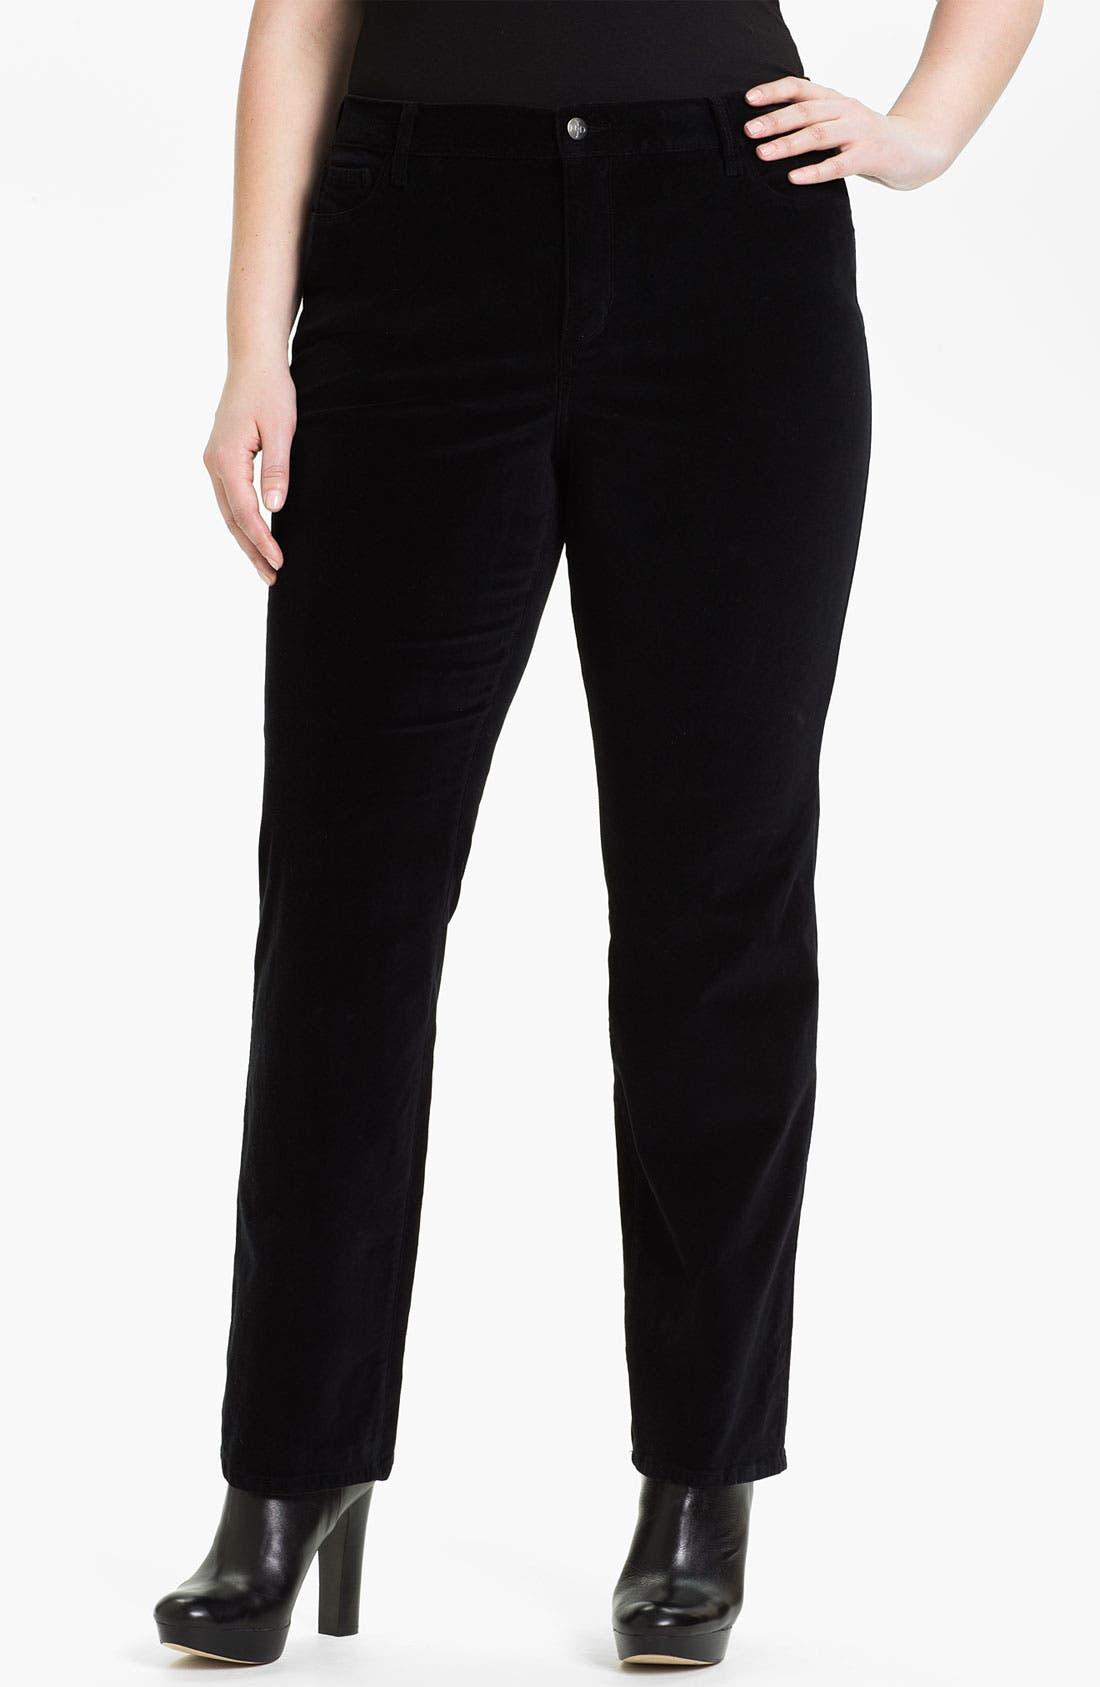 Main Image - NYDJ 'Sheri' Skinny Stretch Velveteen Jeans (Plus)